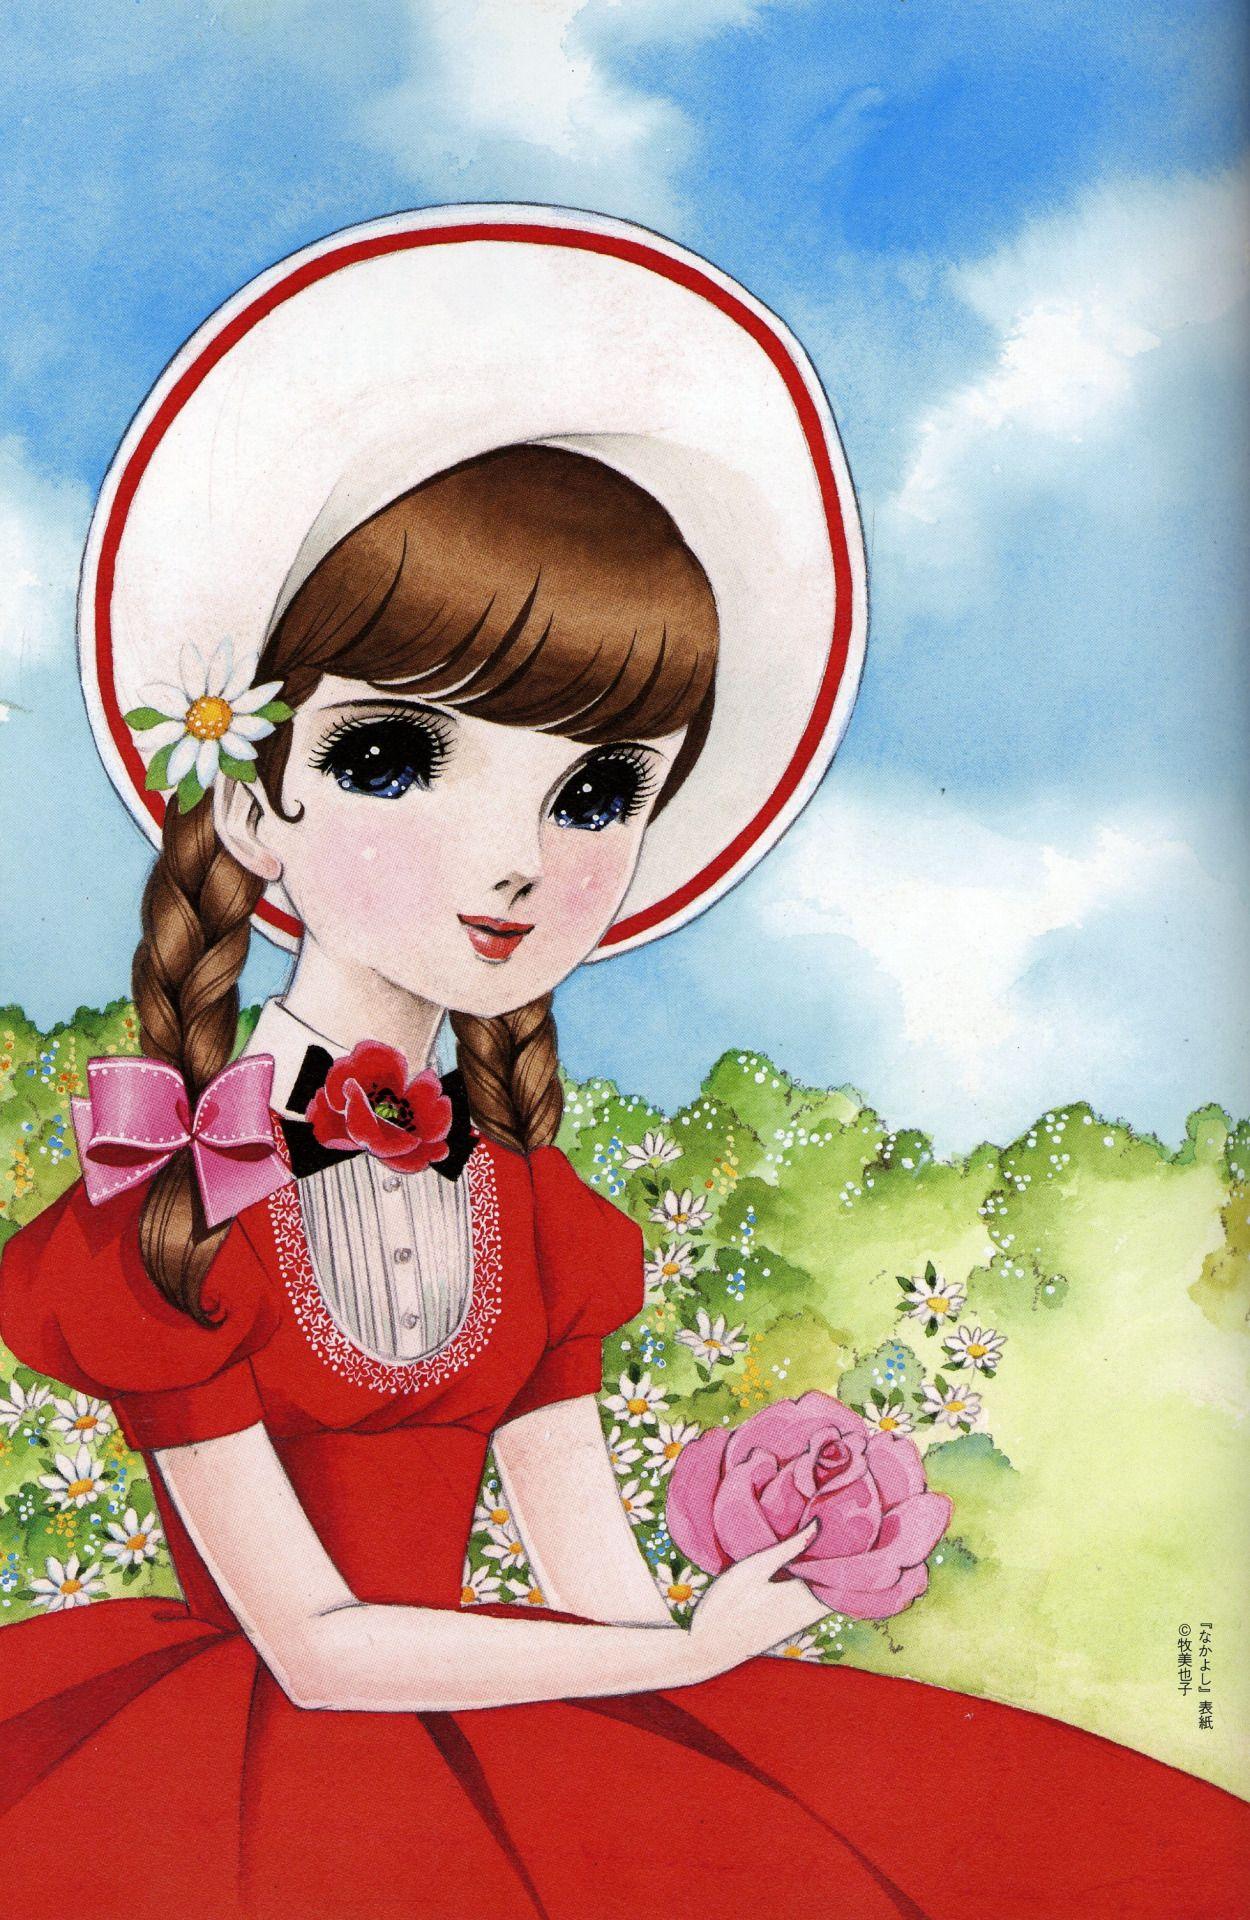 Feh yes vintage manga photo coloring book art retro